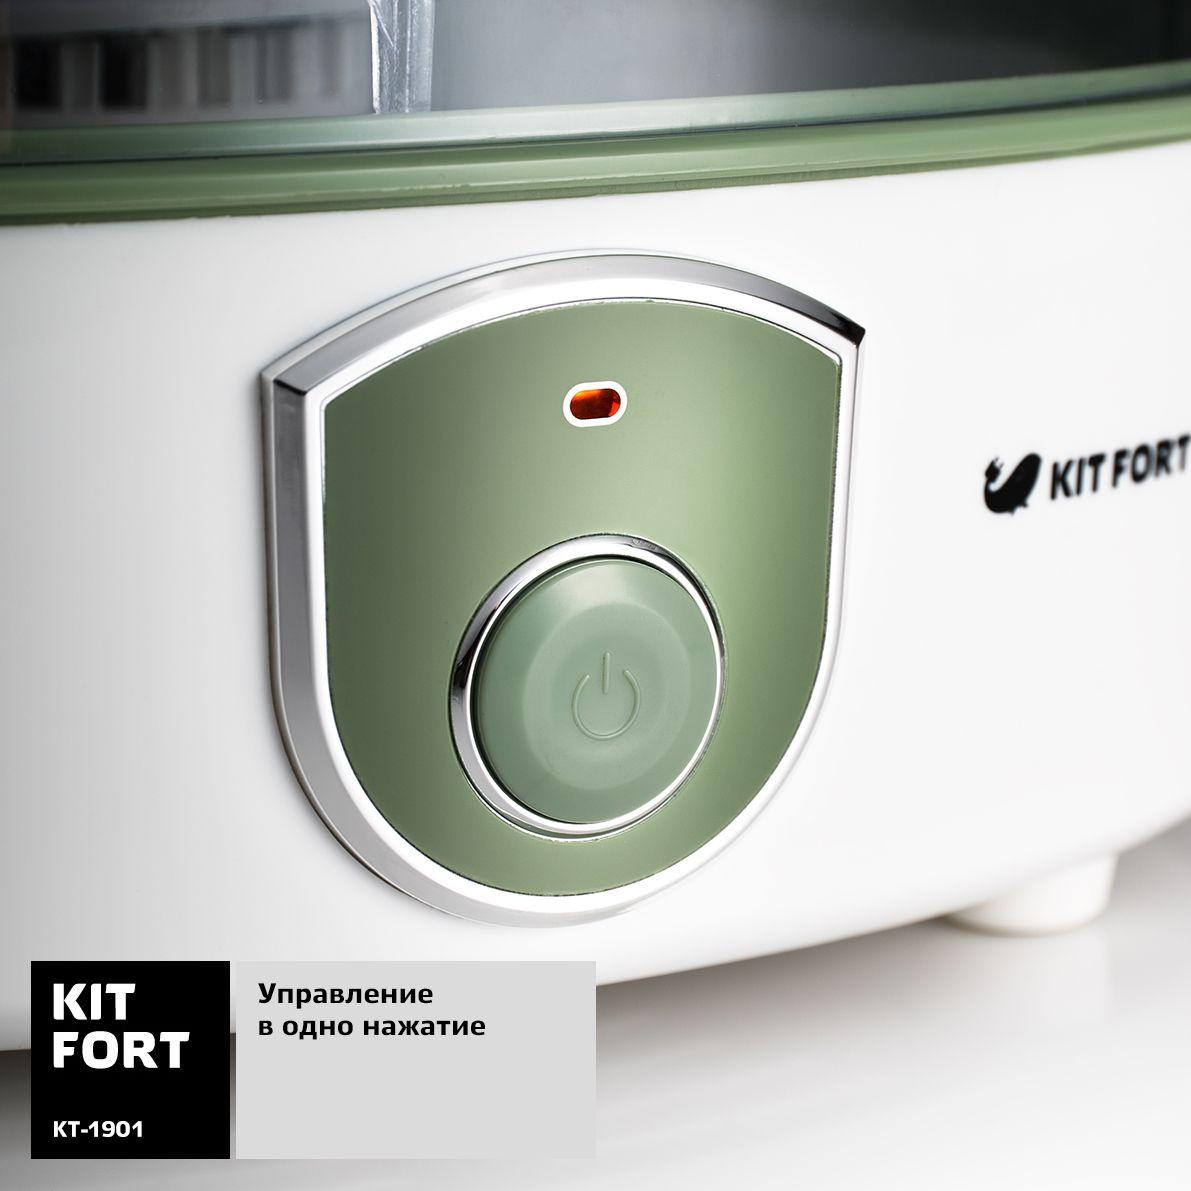 Дегидратор Kitfort КТ-1901, White Kitfort